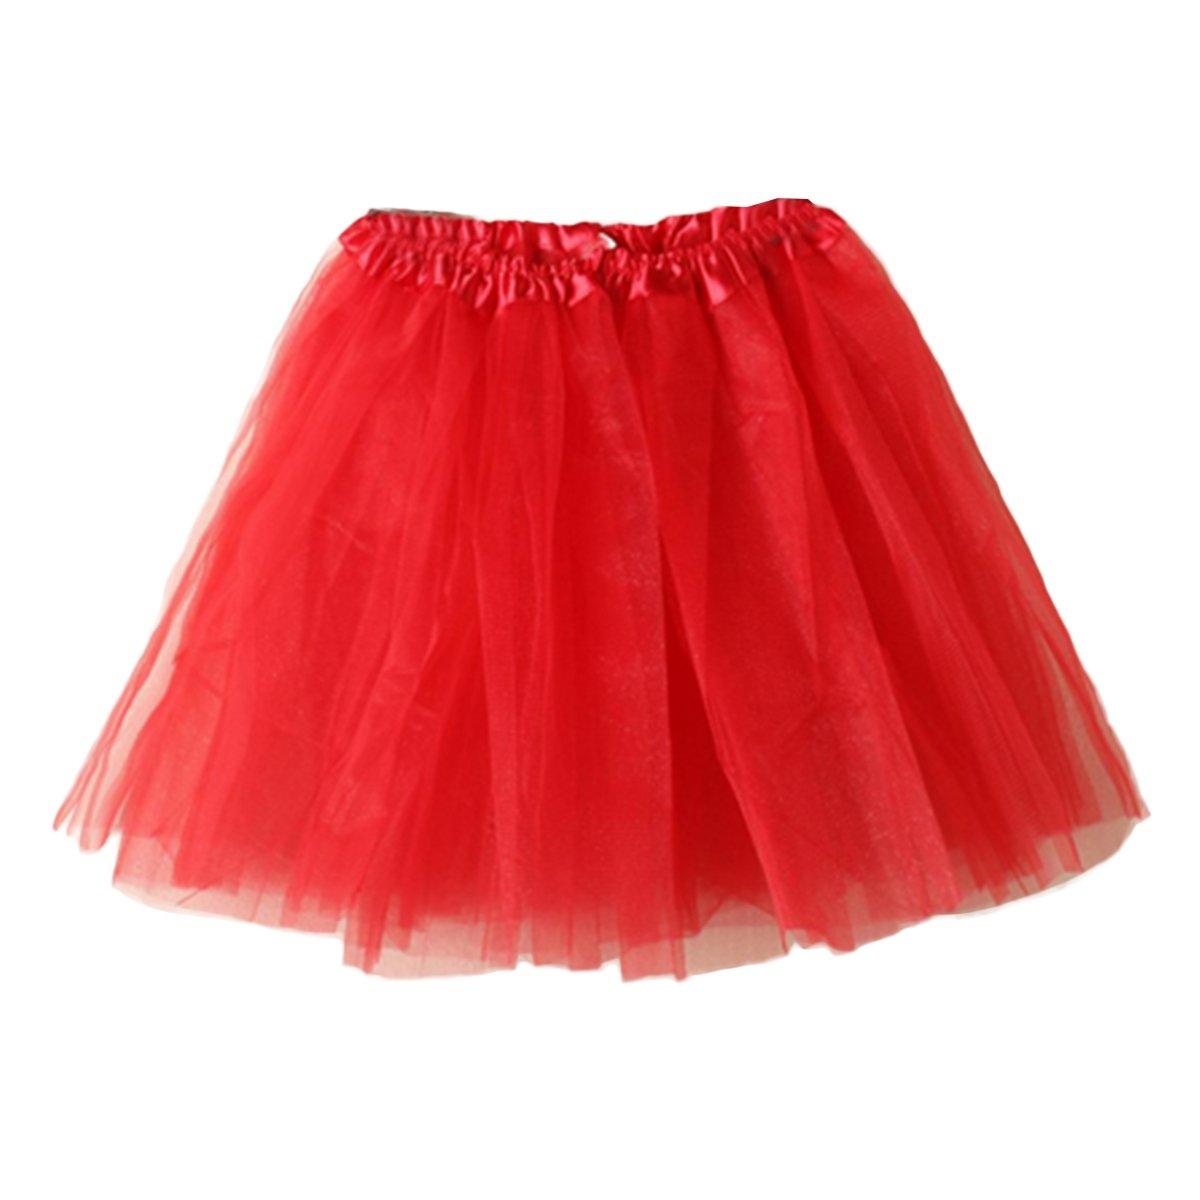 WESTLINK Women's Mini Tutu Skirt Elastic Layered Tulle Costume Party Dance